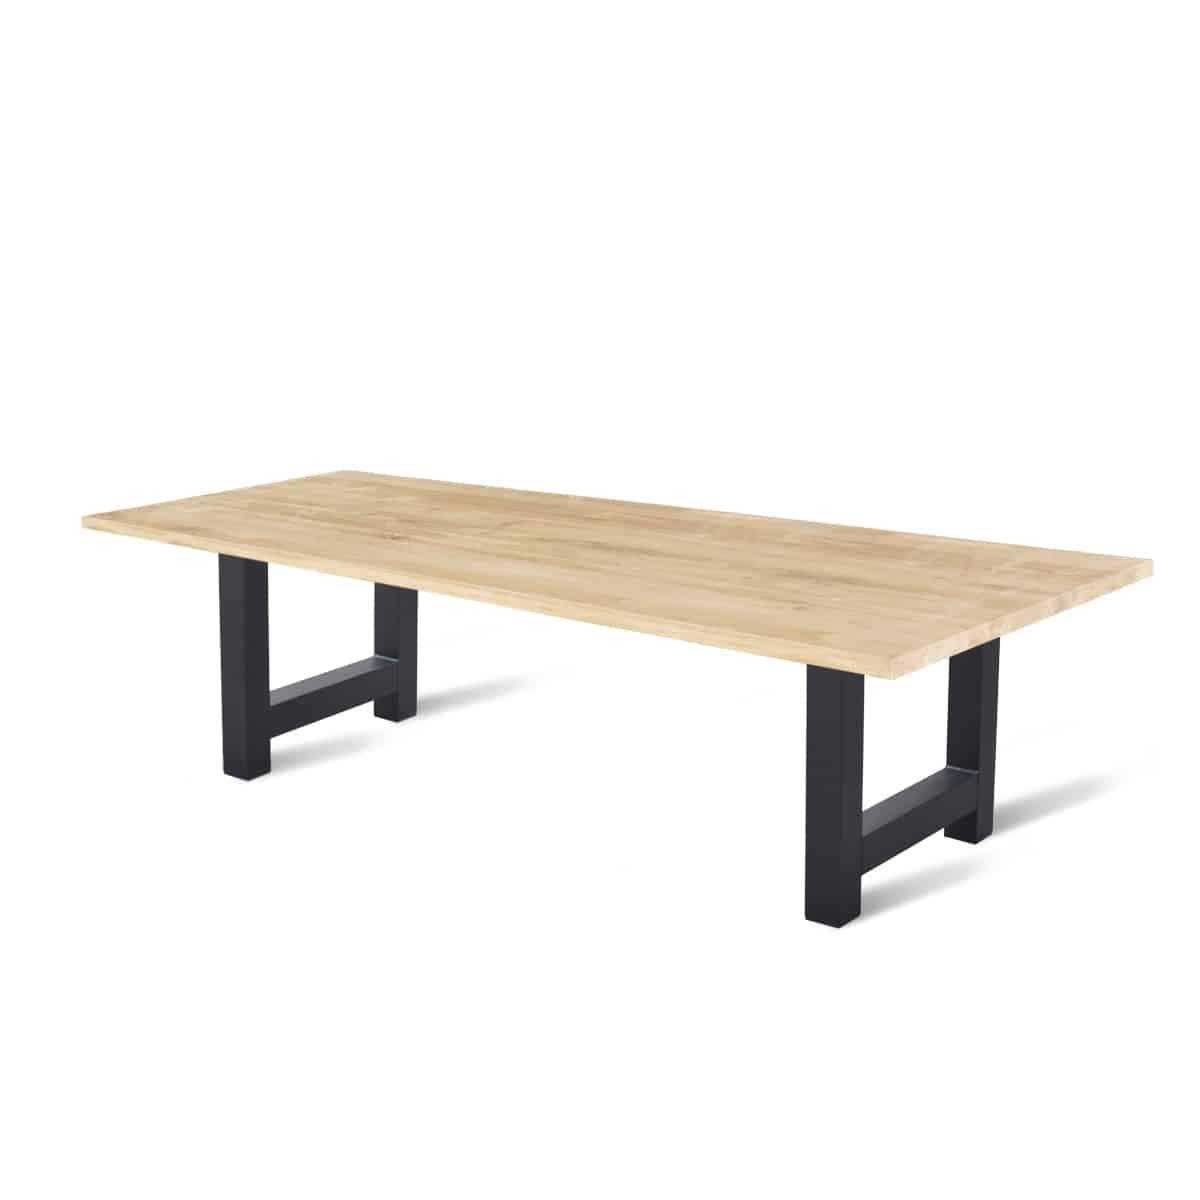 Massief eiken houten eetkamer tafel eettafel keuken meubelmaker friesland